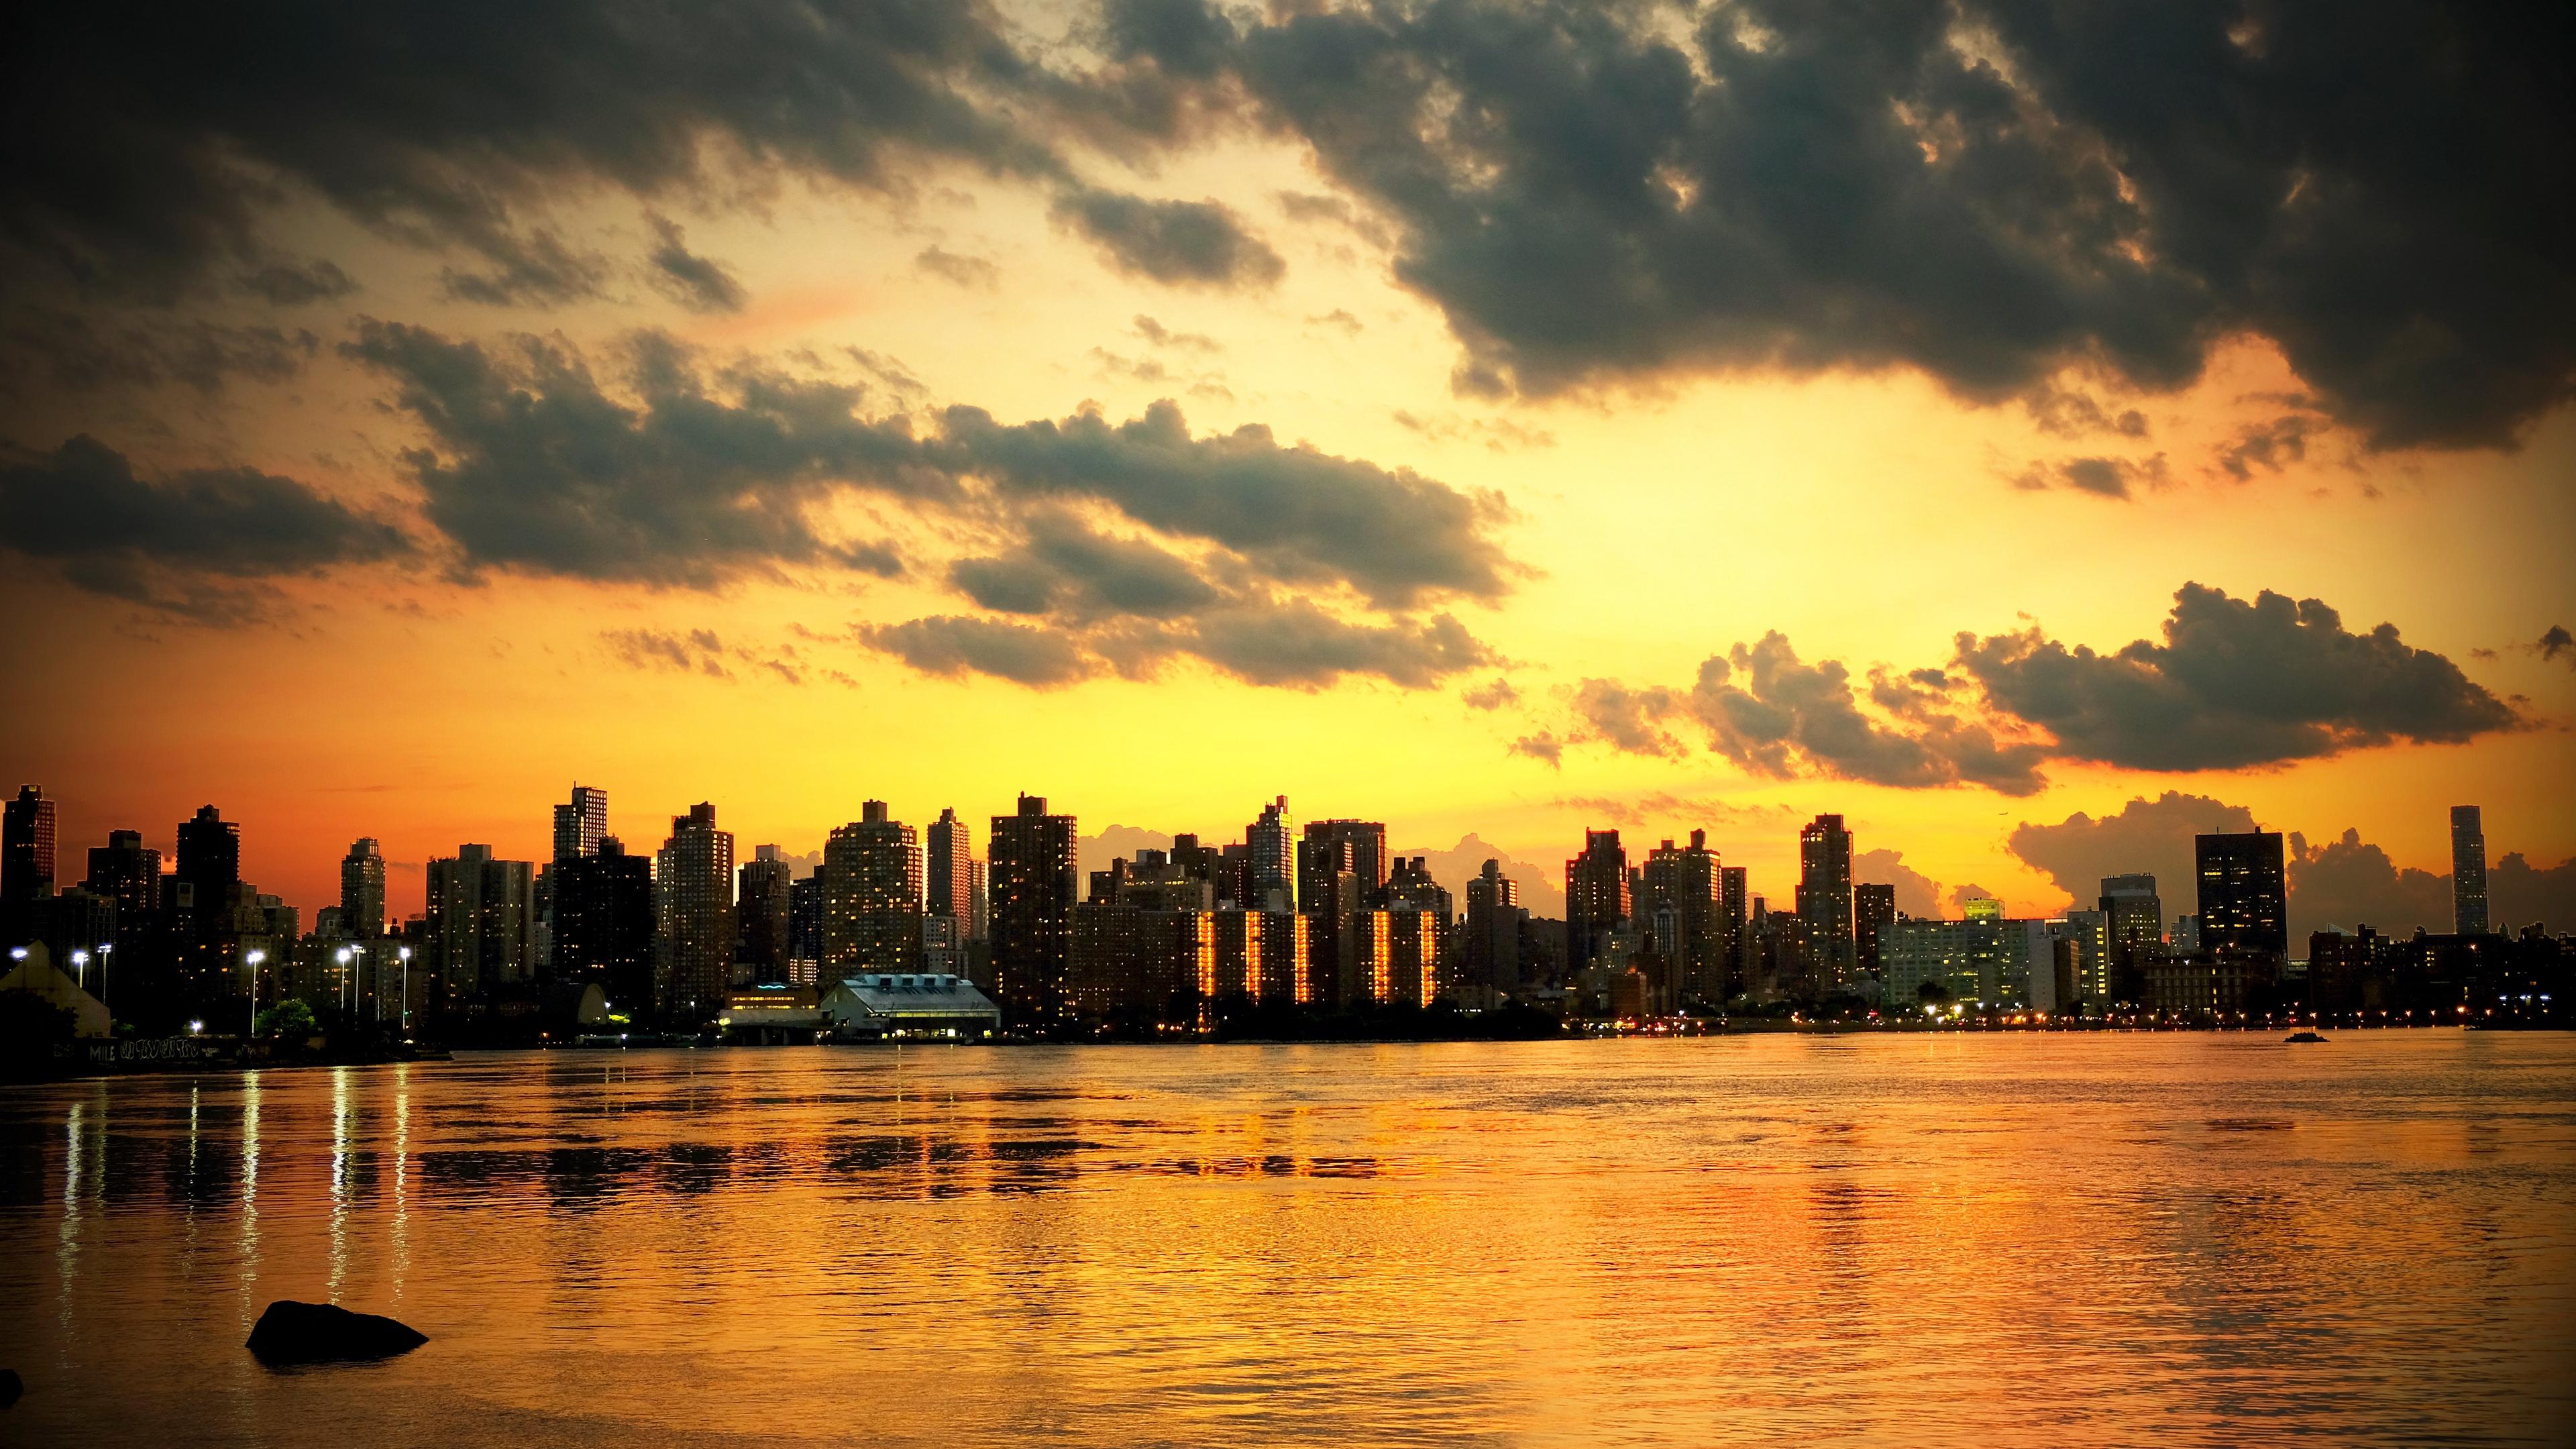 new york sunset skyscrapers ocean 4k 1538068191 - new york, sunset, skyscrapers, ocean 4k - sunset, Skyscrapers, new york